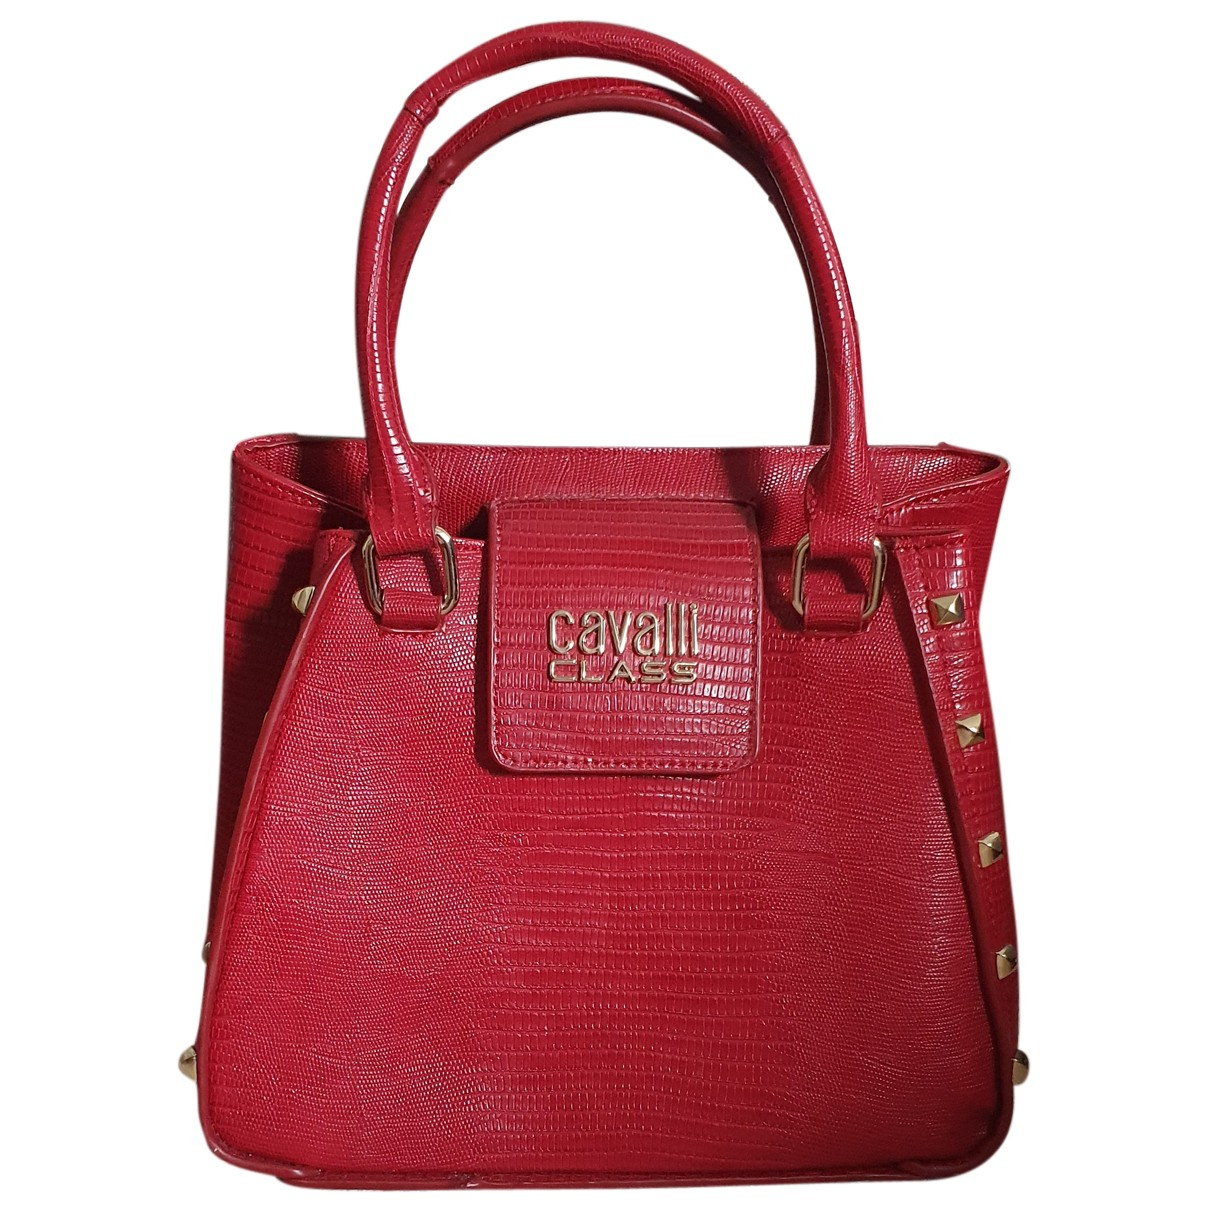 Class Cavalli \N Handtasche in  Rot Polyester